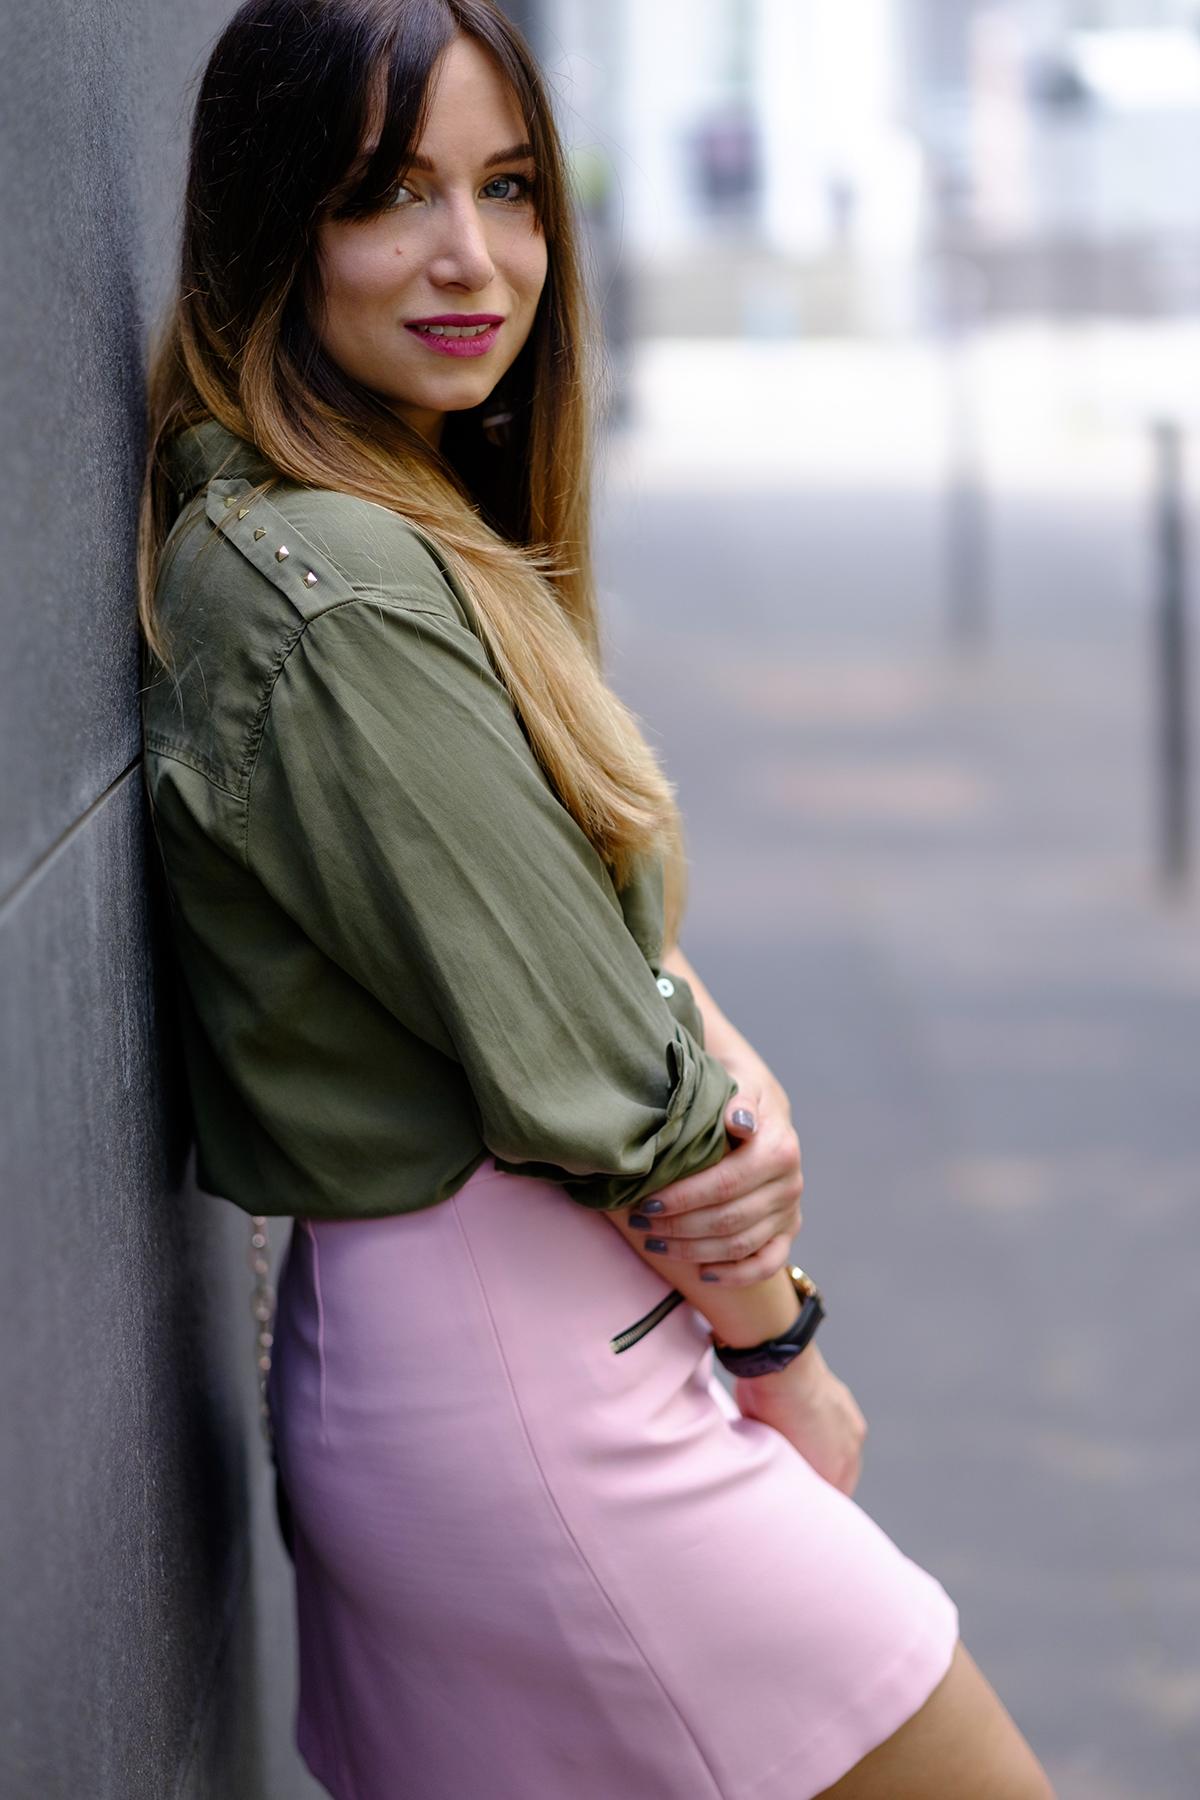 chemise militaire kaki et jupe rose